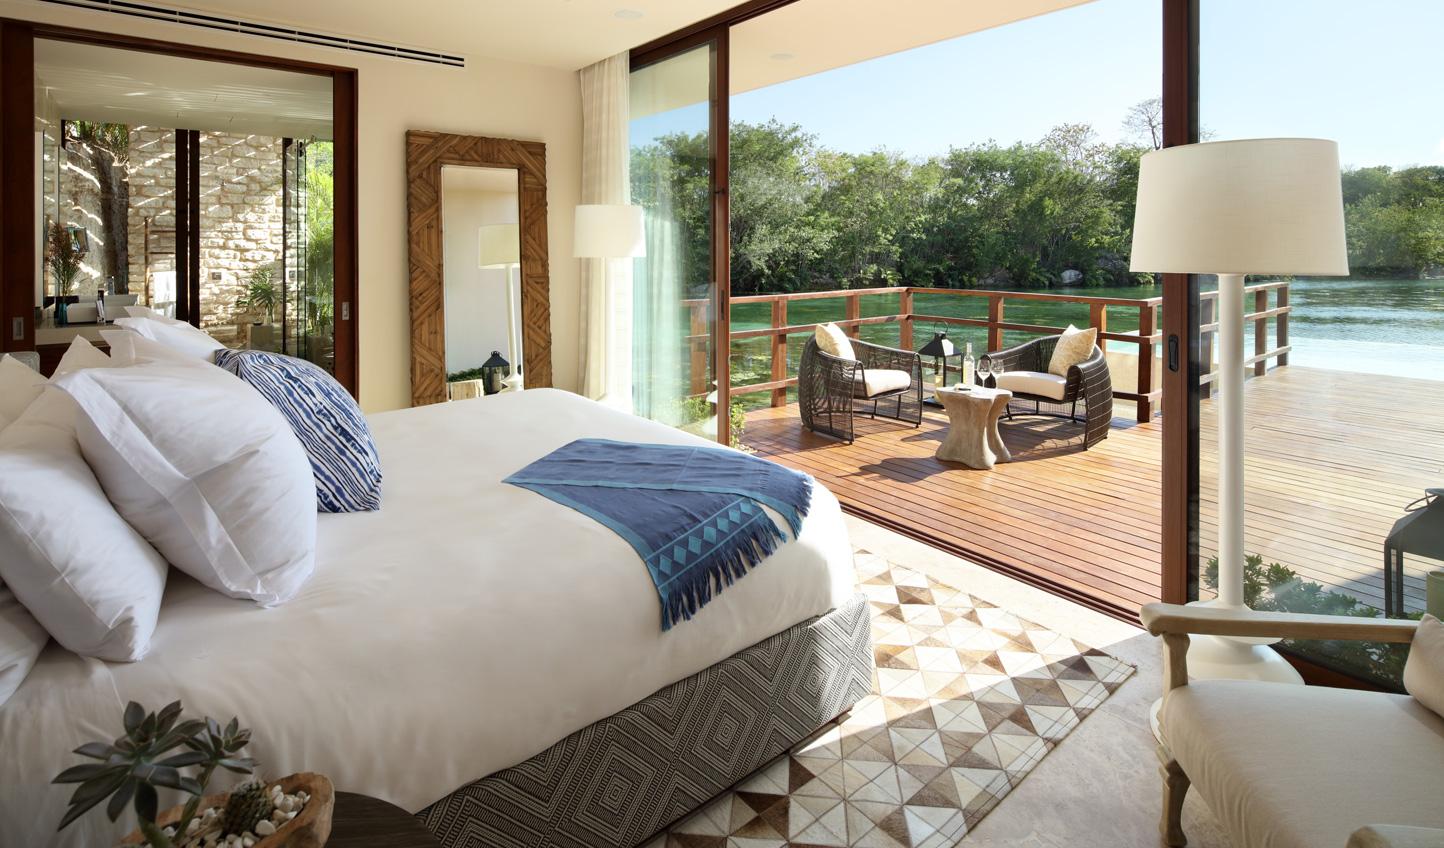 Wake up to beautiful views across the lagoon